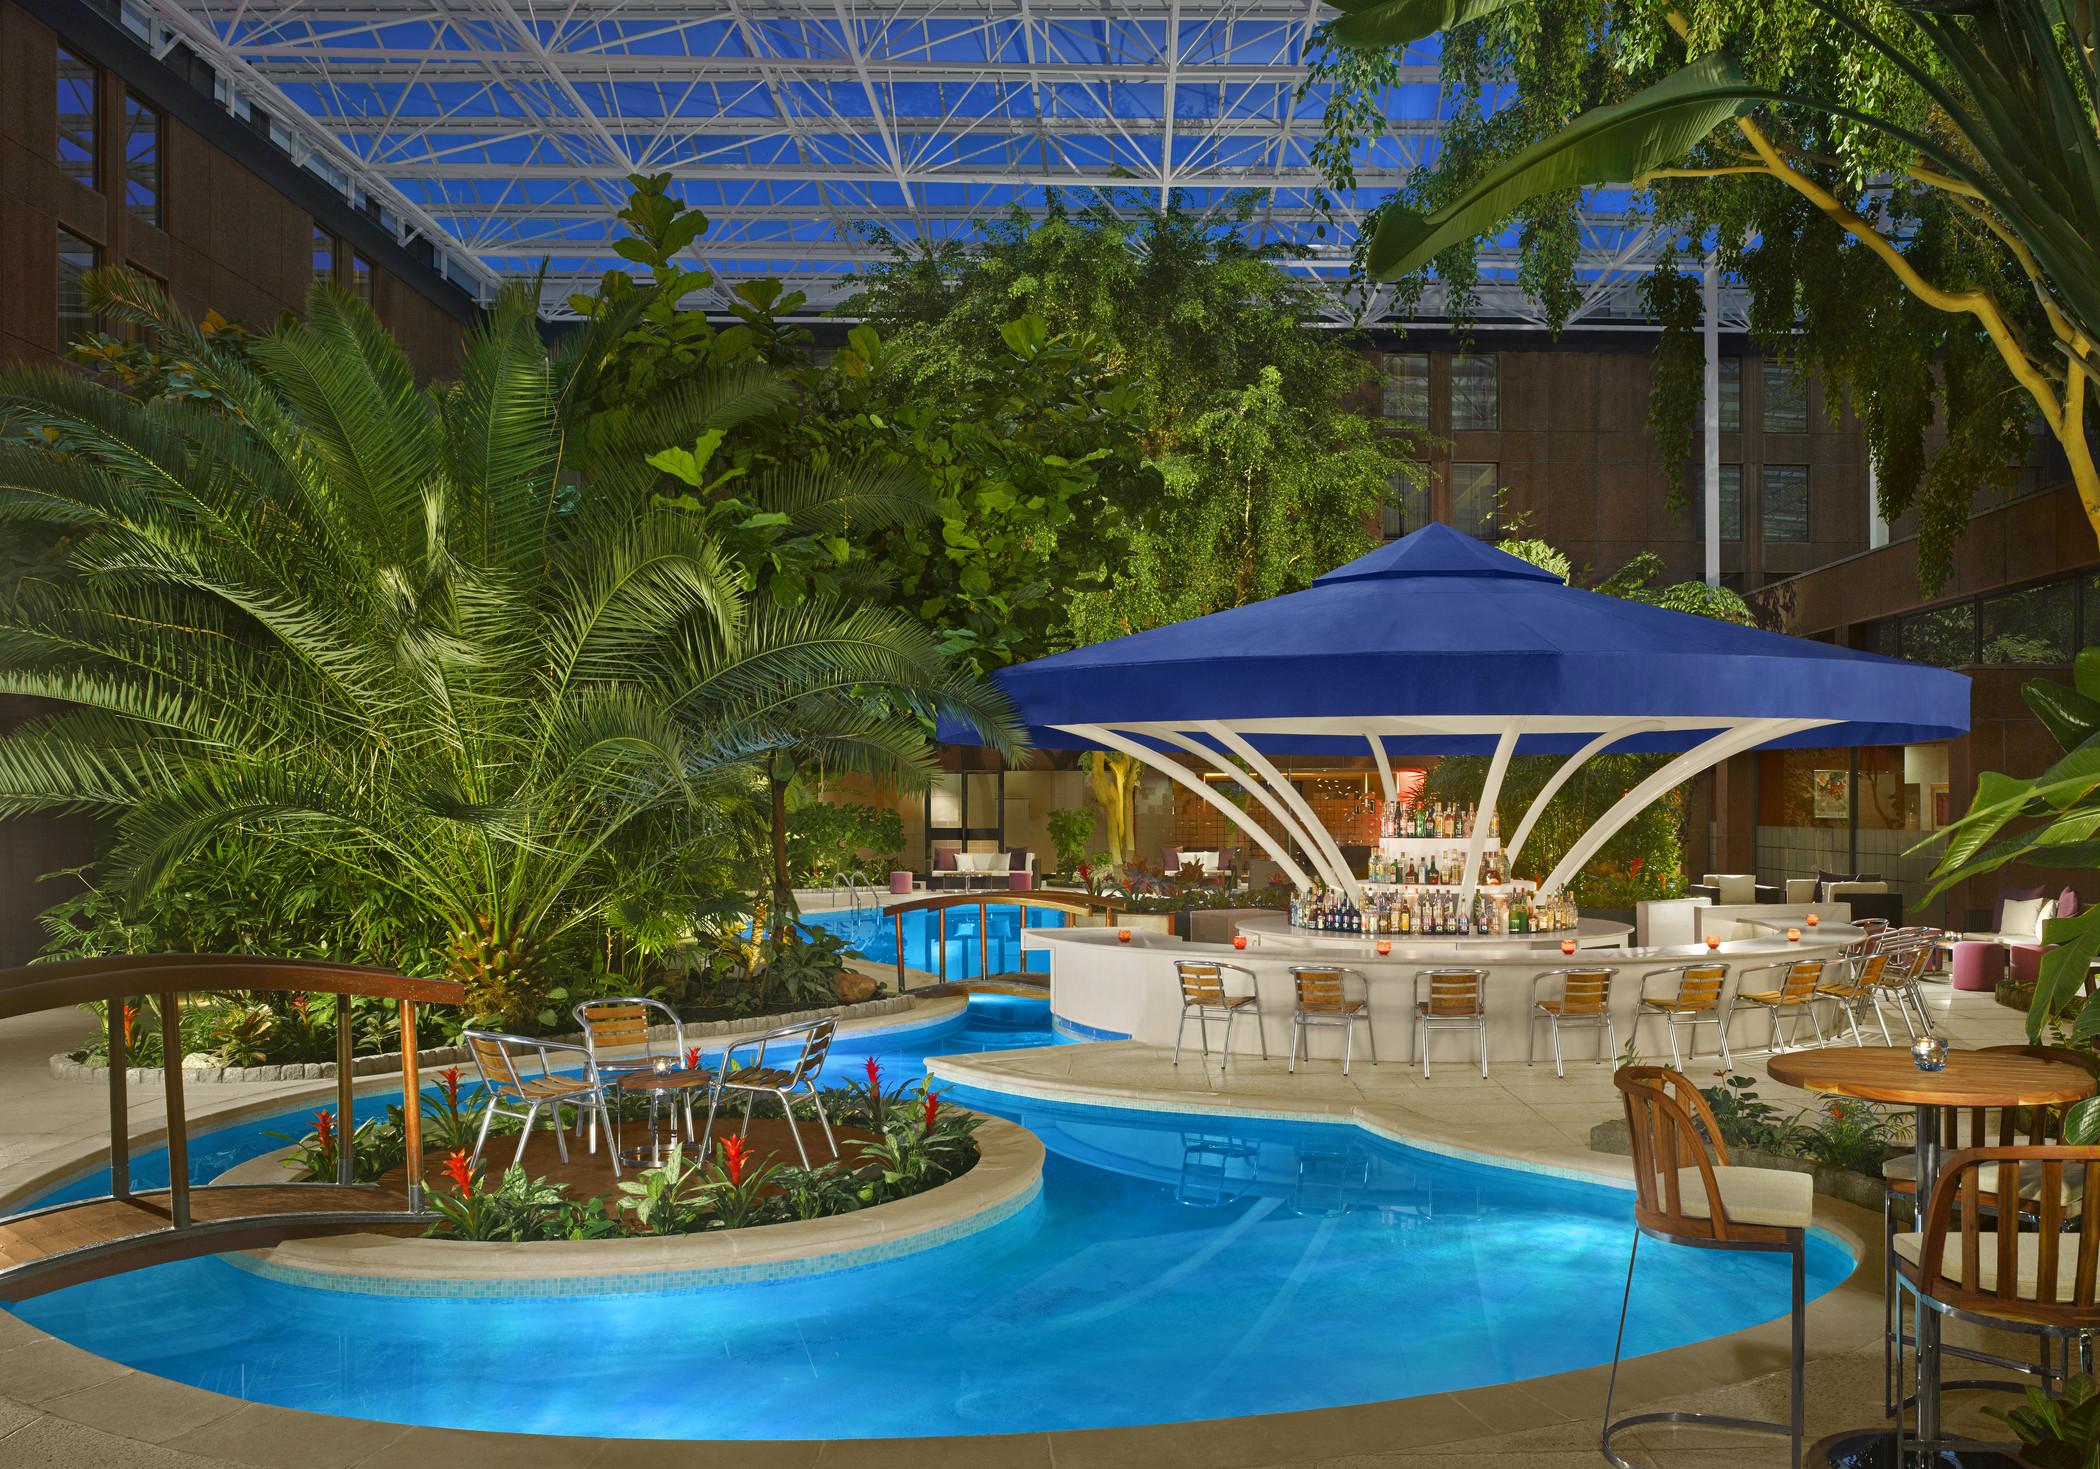 Book sky garden pool at sheraton skyline hotel london for Garden pool book